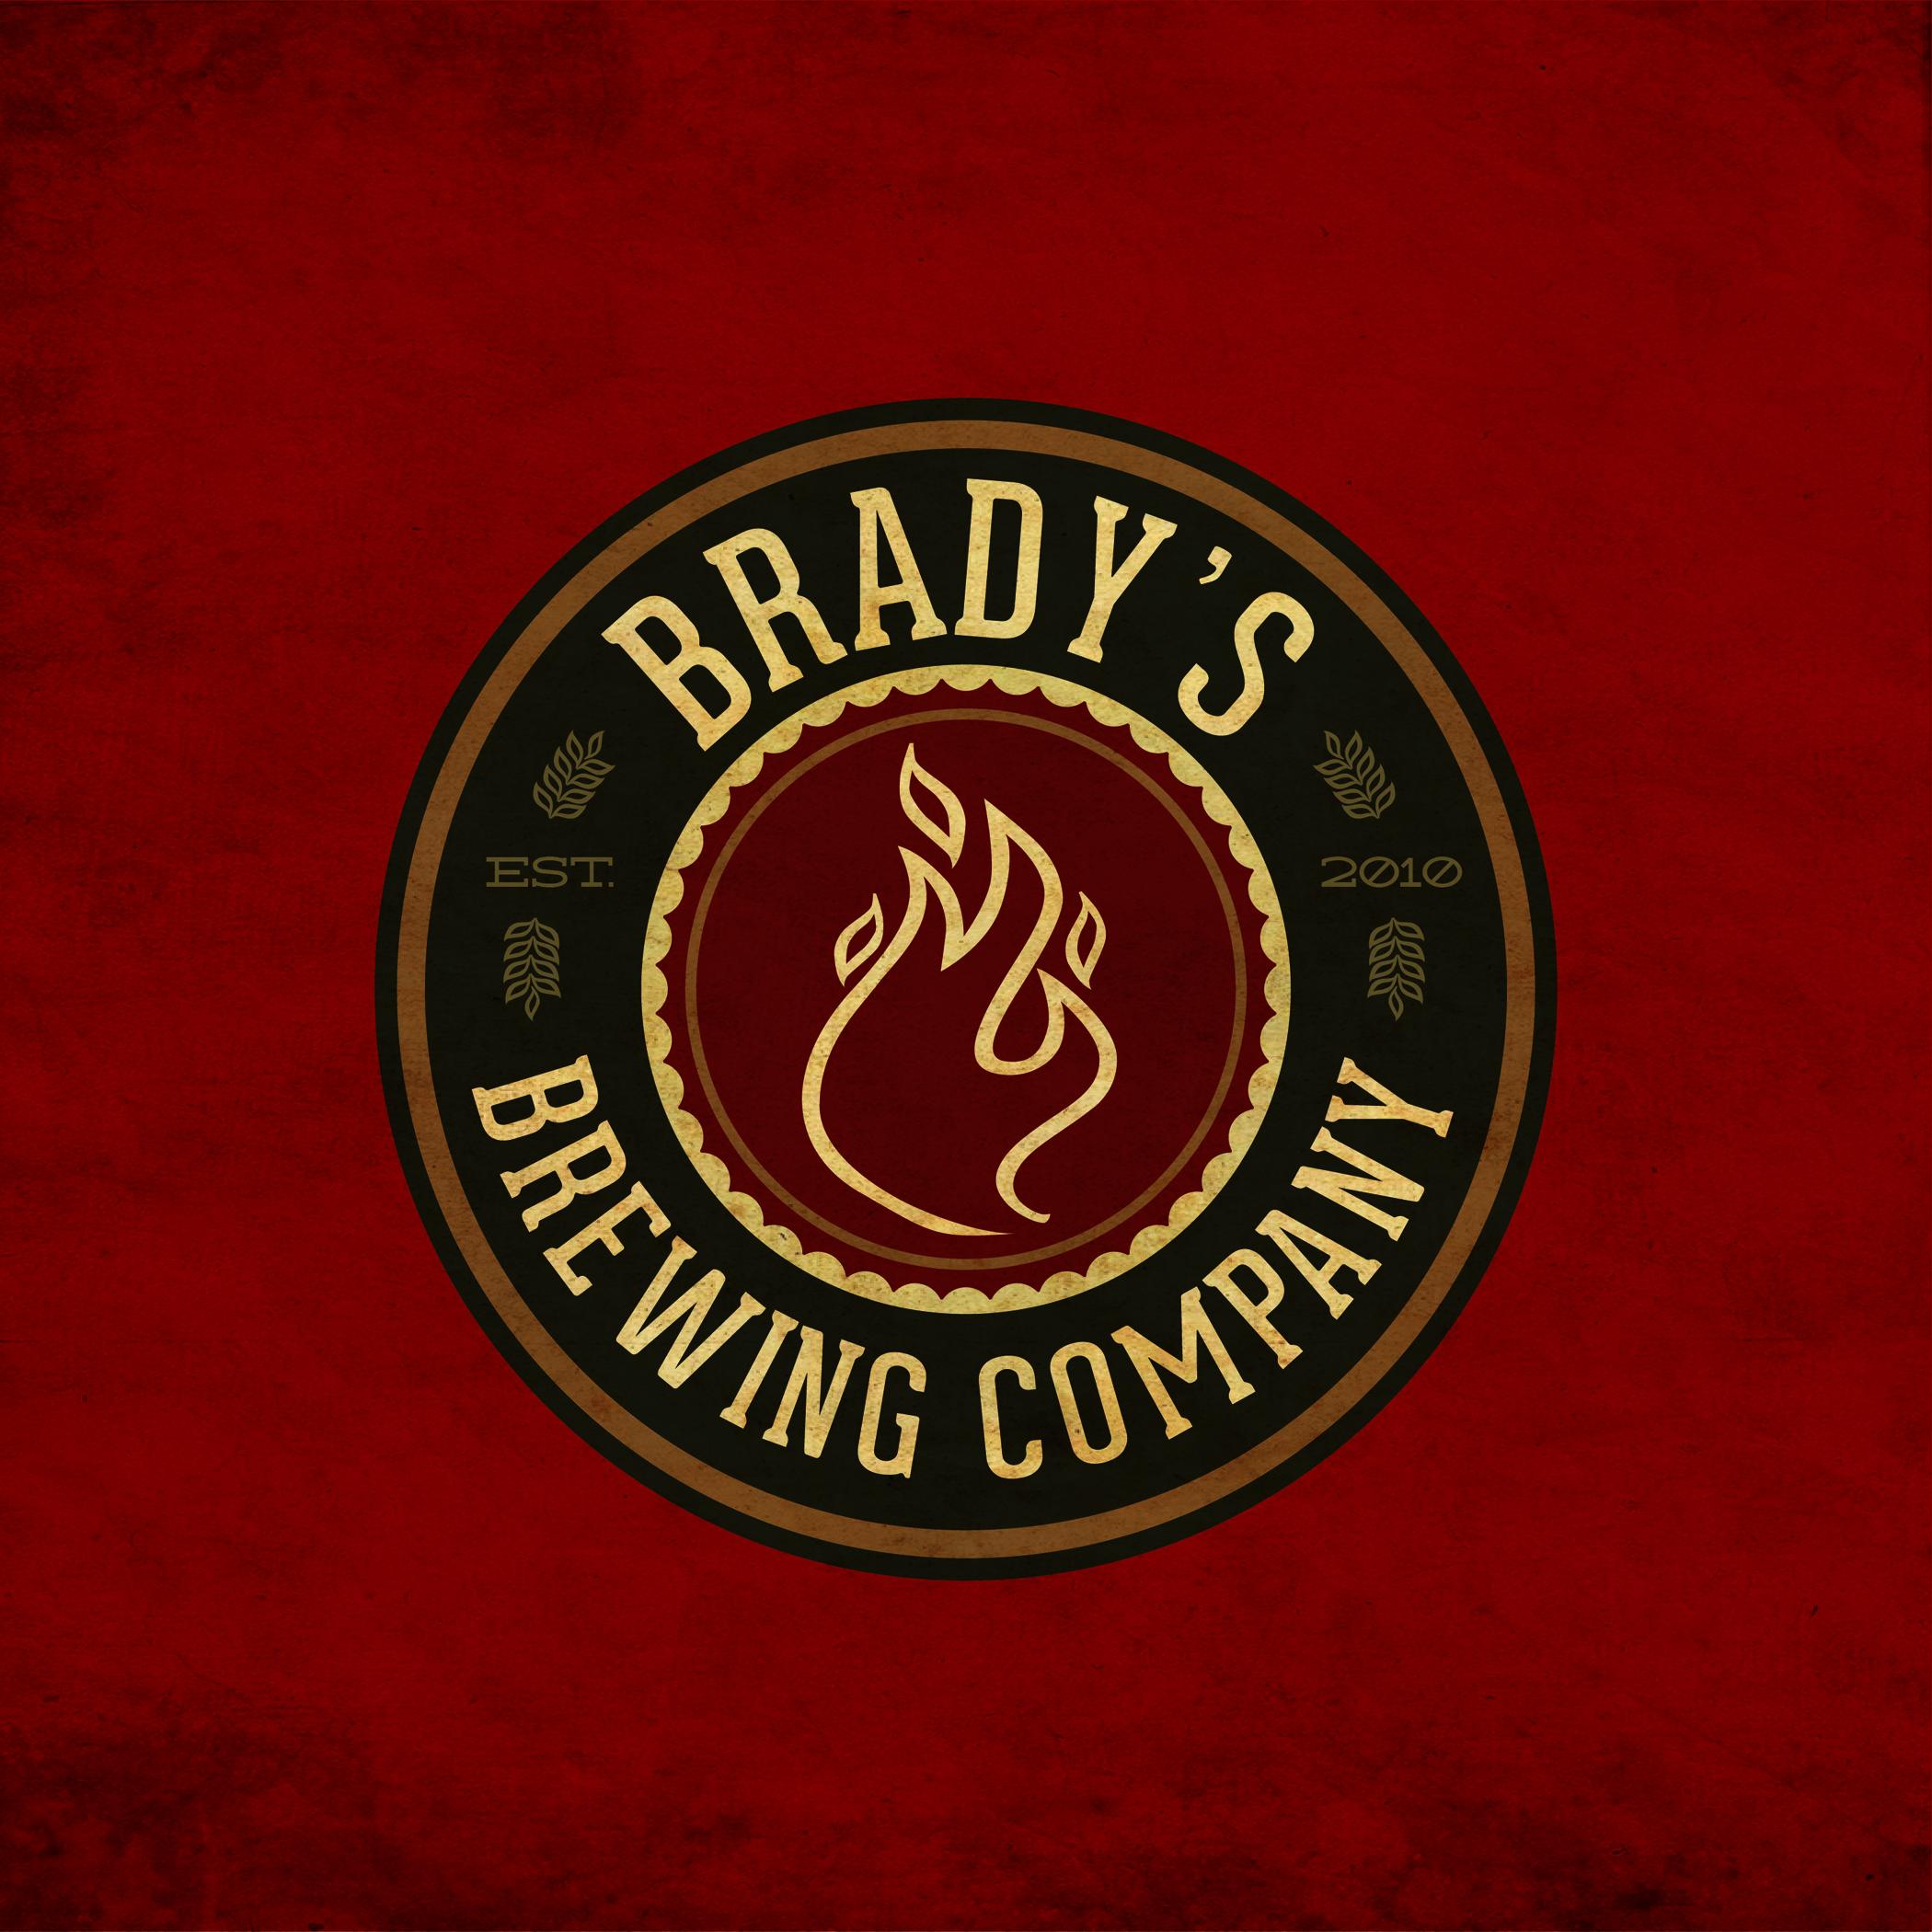 BradysBrewingCo_LogoFinal_Red.jpg